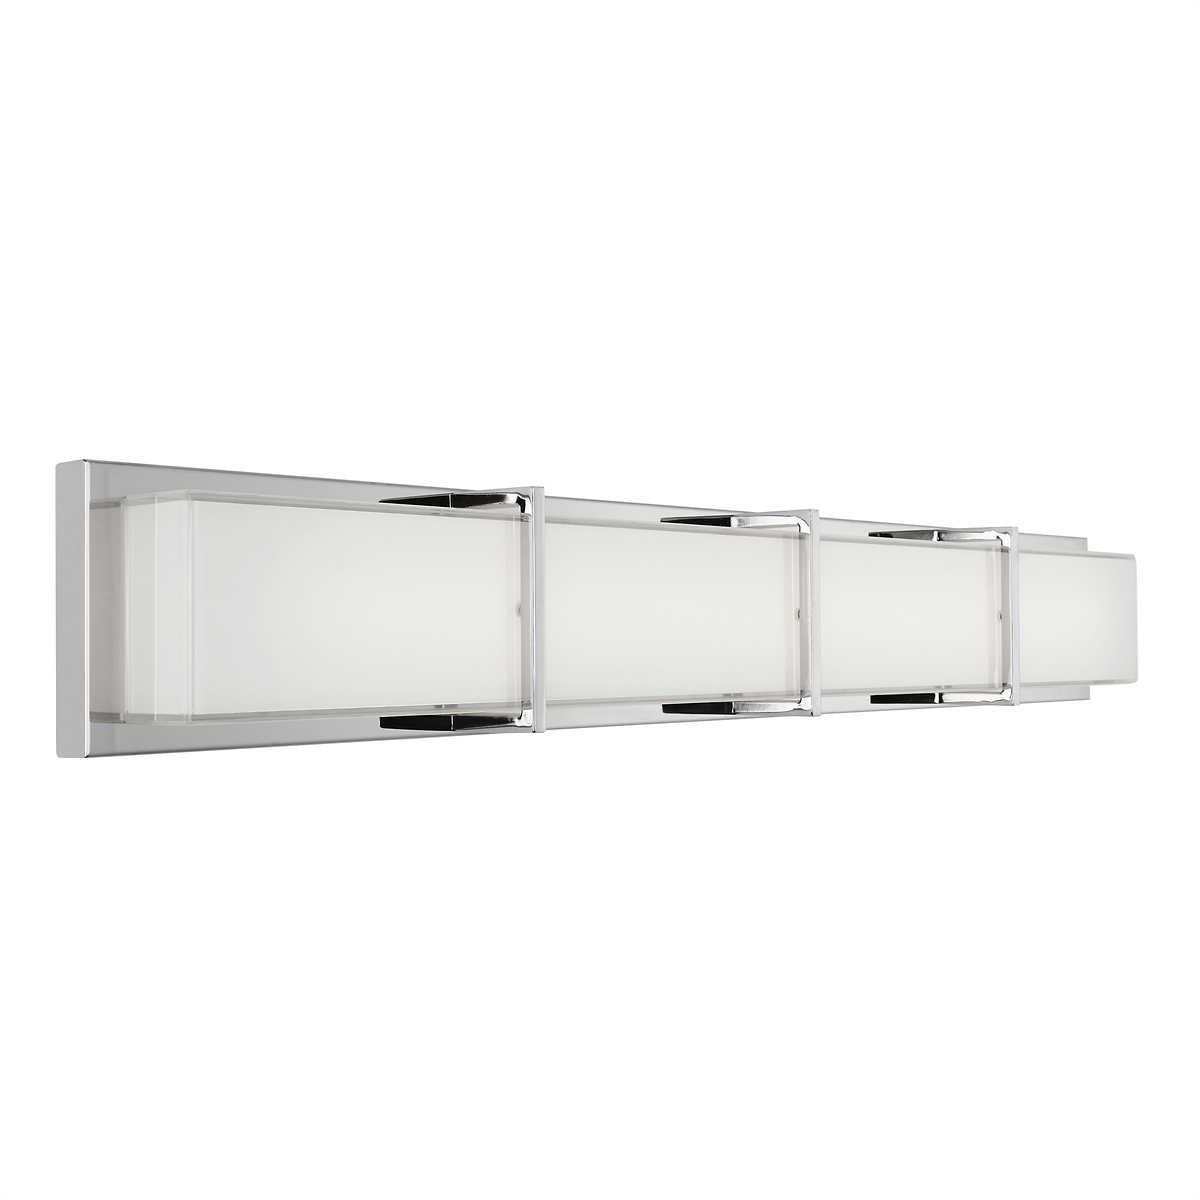 Bathroom Vanity Lights Costco bath lighting | costco